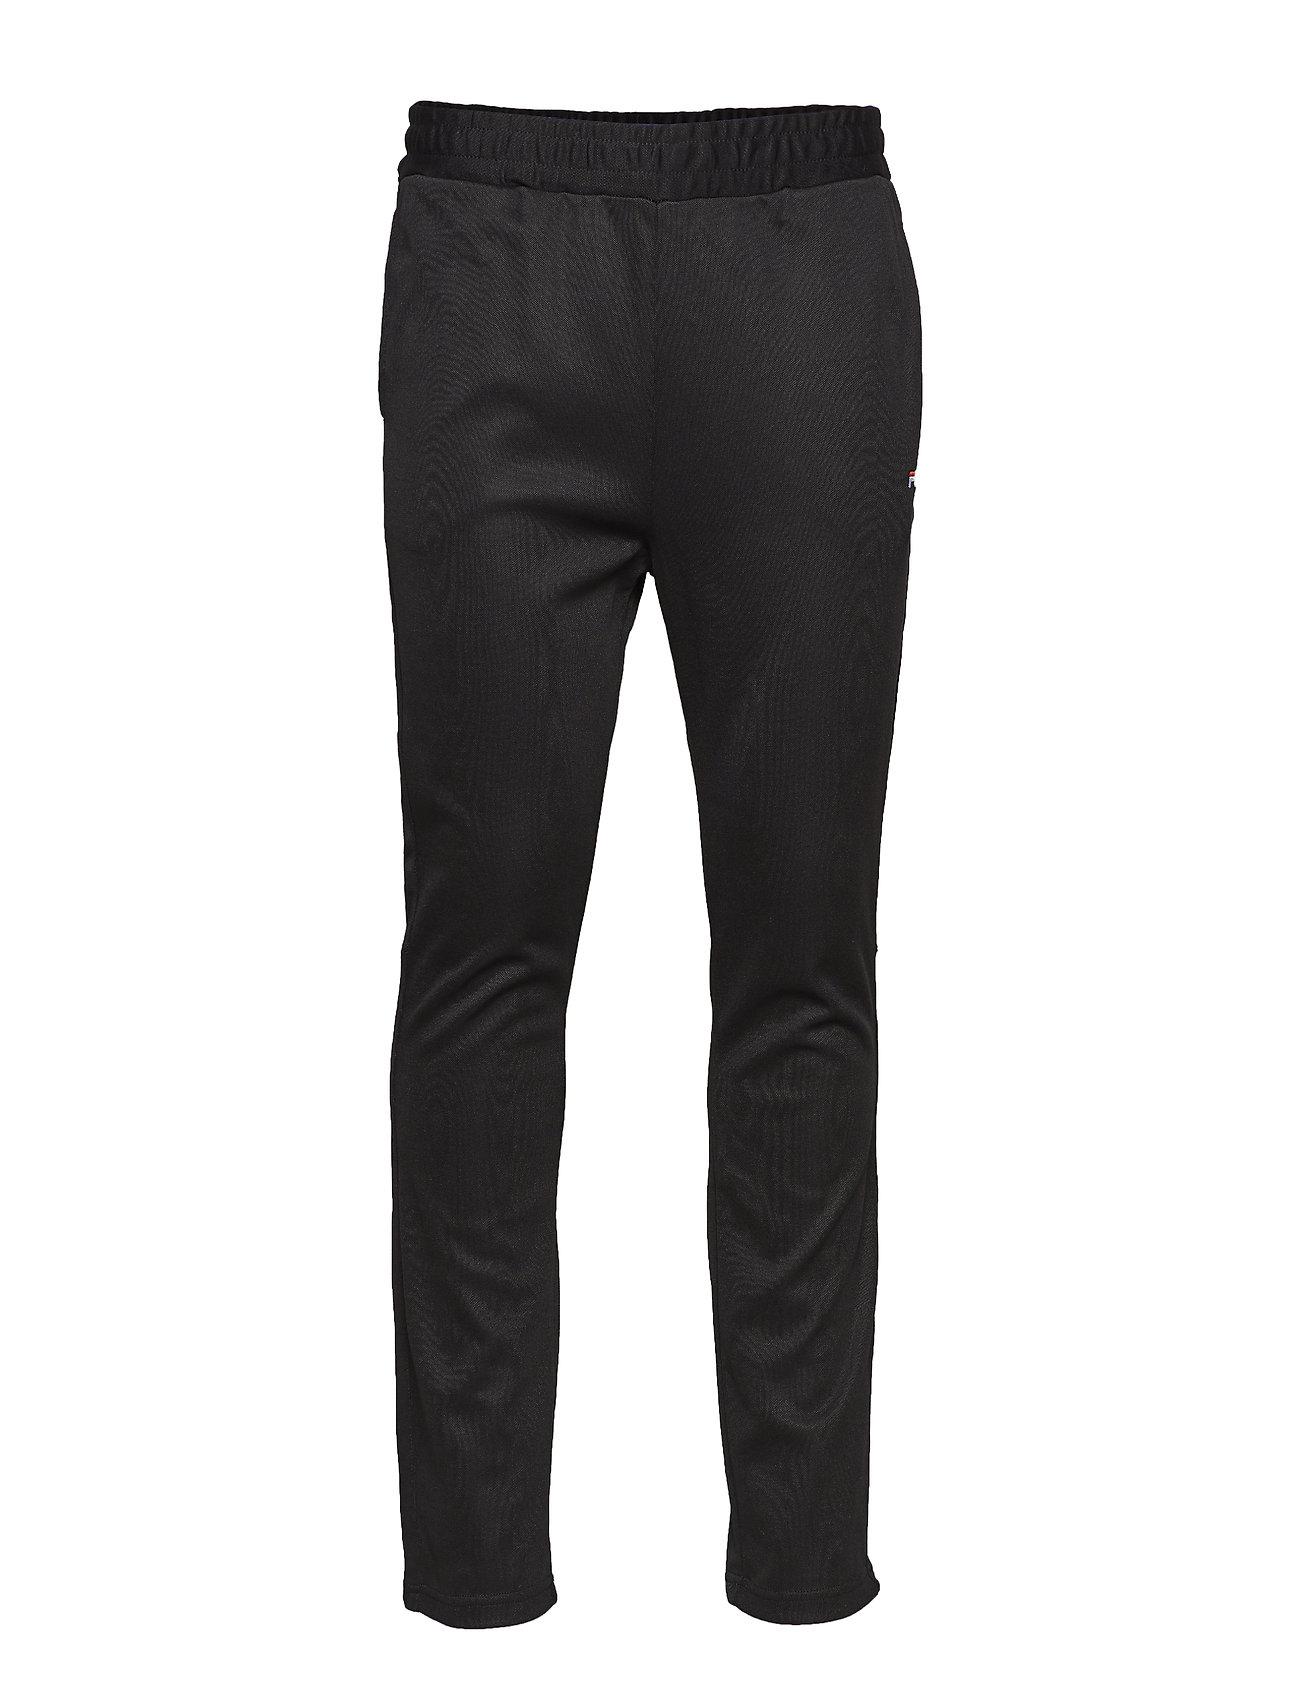 FILA Nolin Track Pants Tight - BLACK